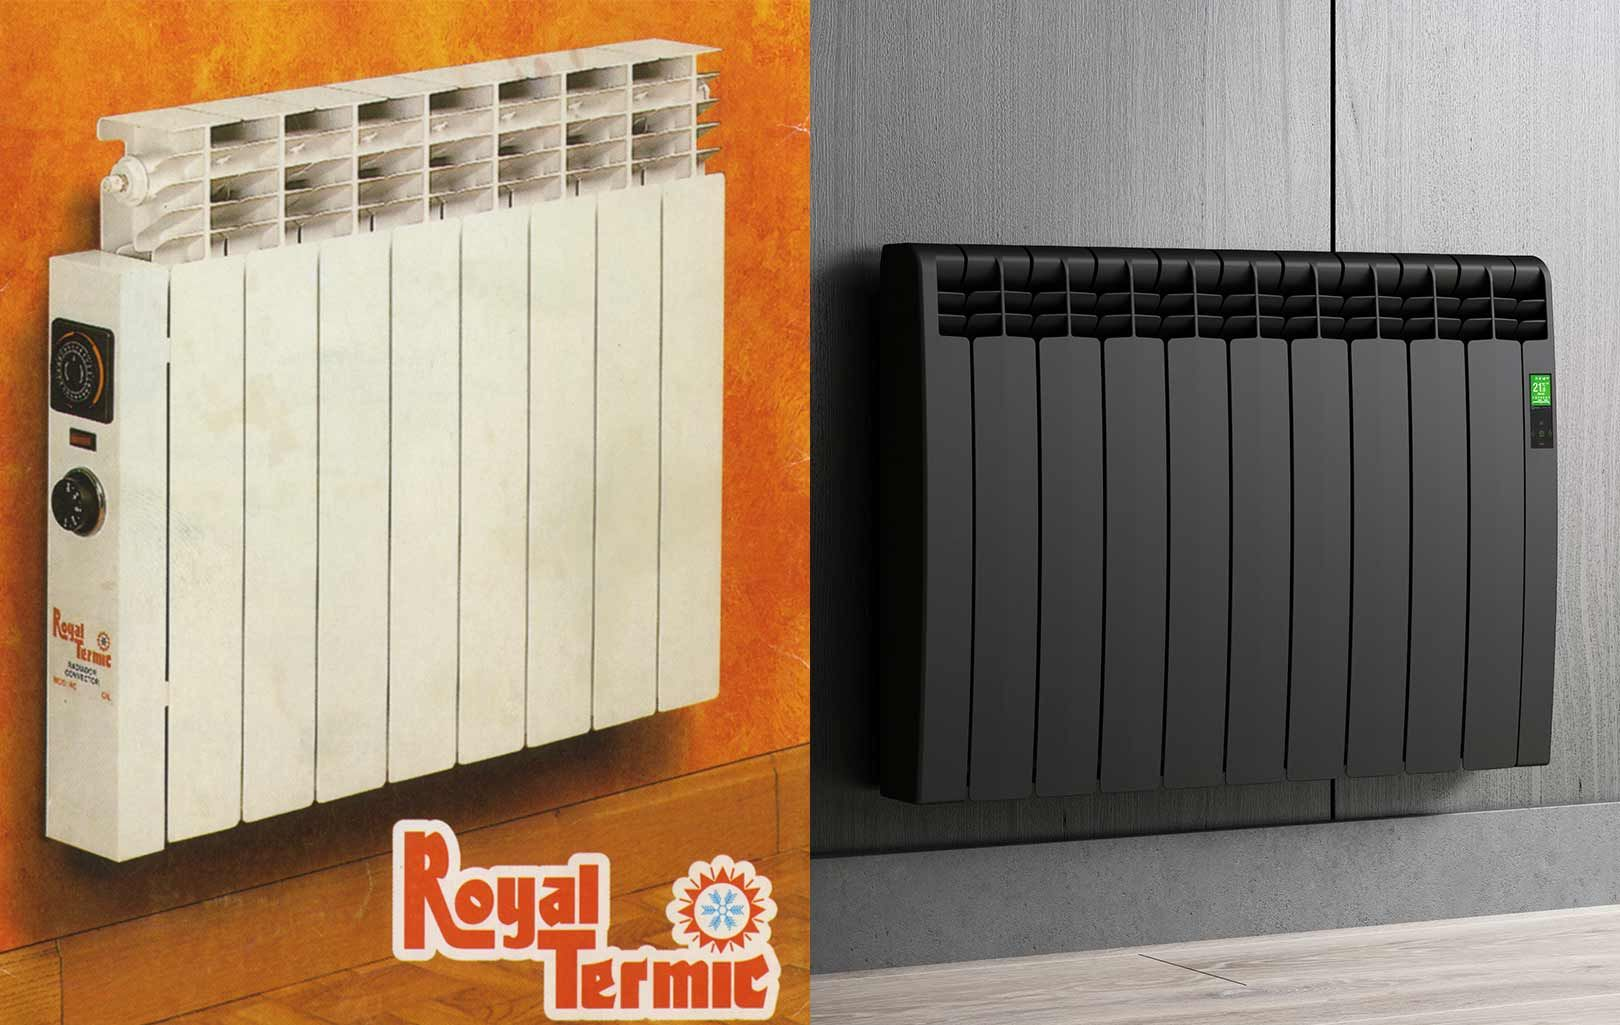 Design innovation in electric radiators